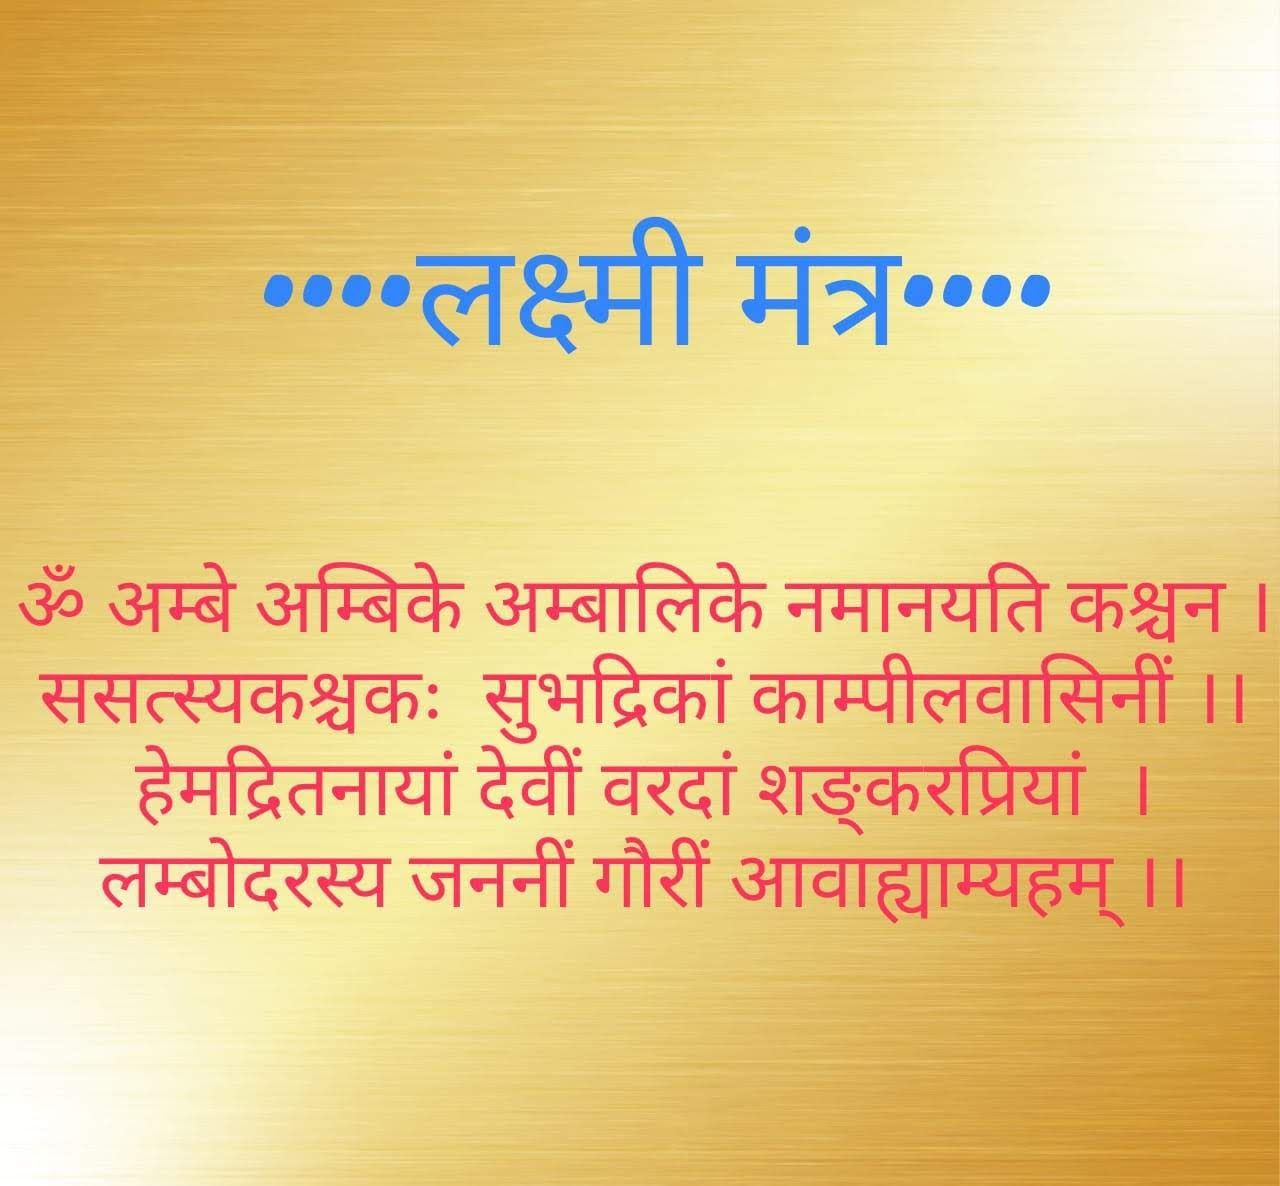 Laxmi mantra लक्ष्मी मंत्र | God is great in